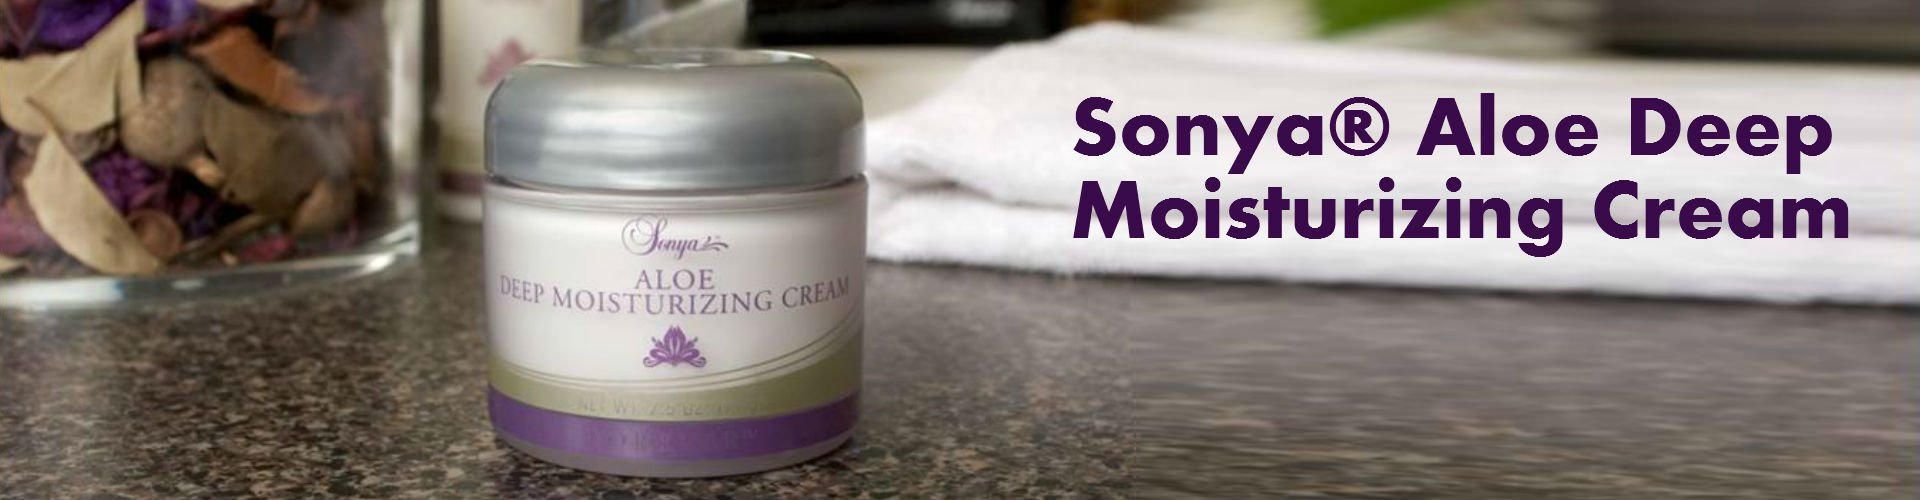 Aloe Vera Feuchtigkeitscreme, Deep Moisturizing Cream 311